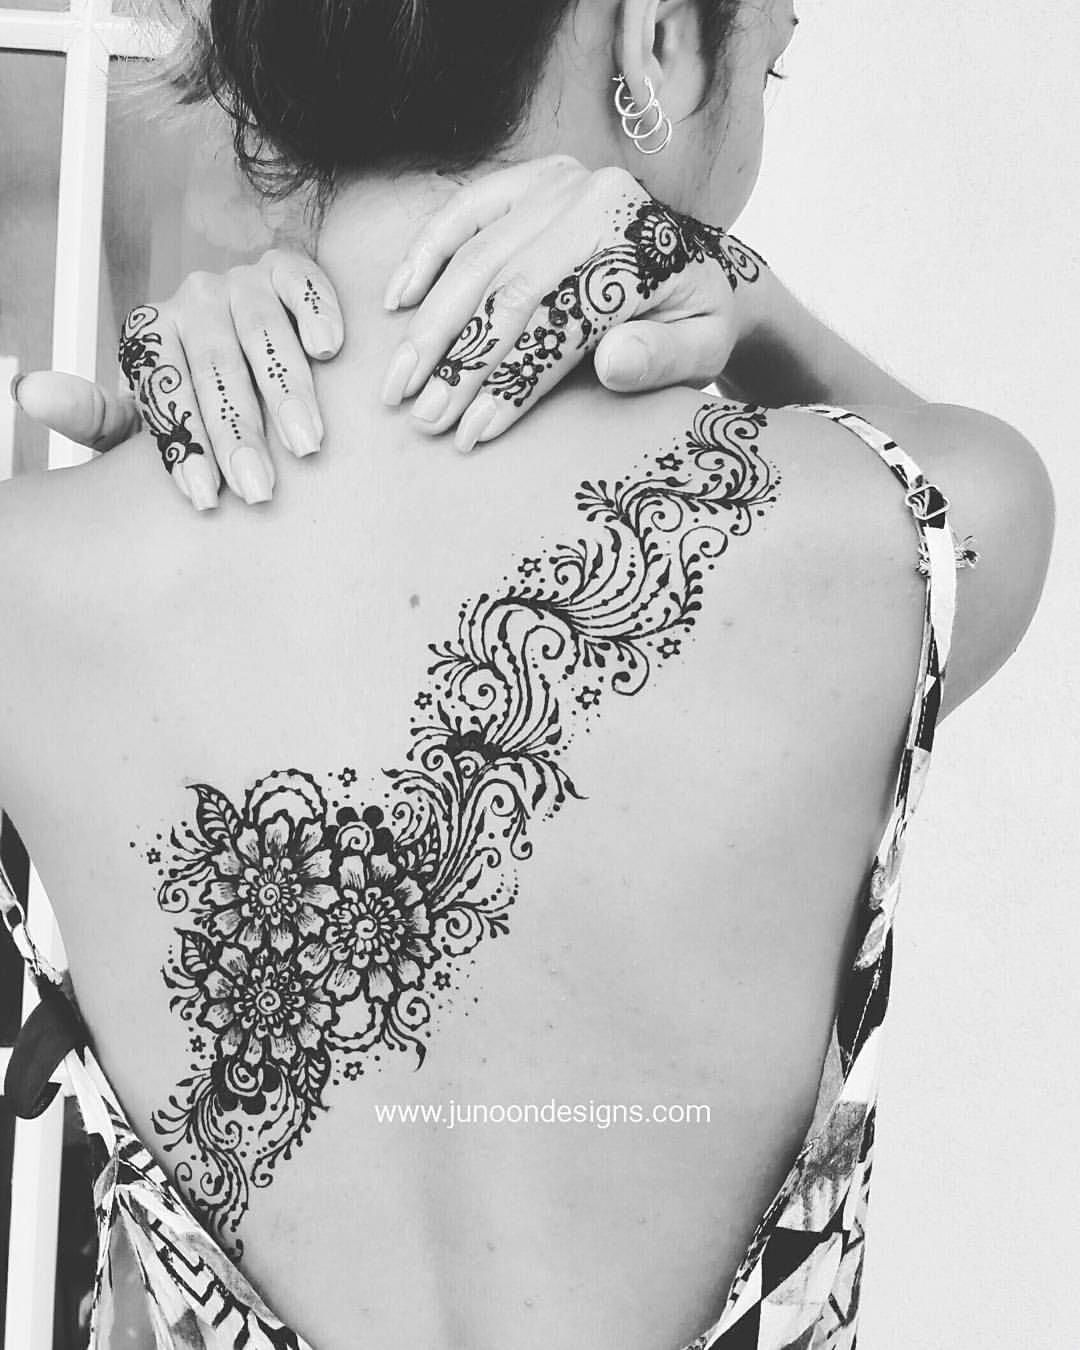 Tattoos for men Thigh tattoos women, Tattoos for guys